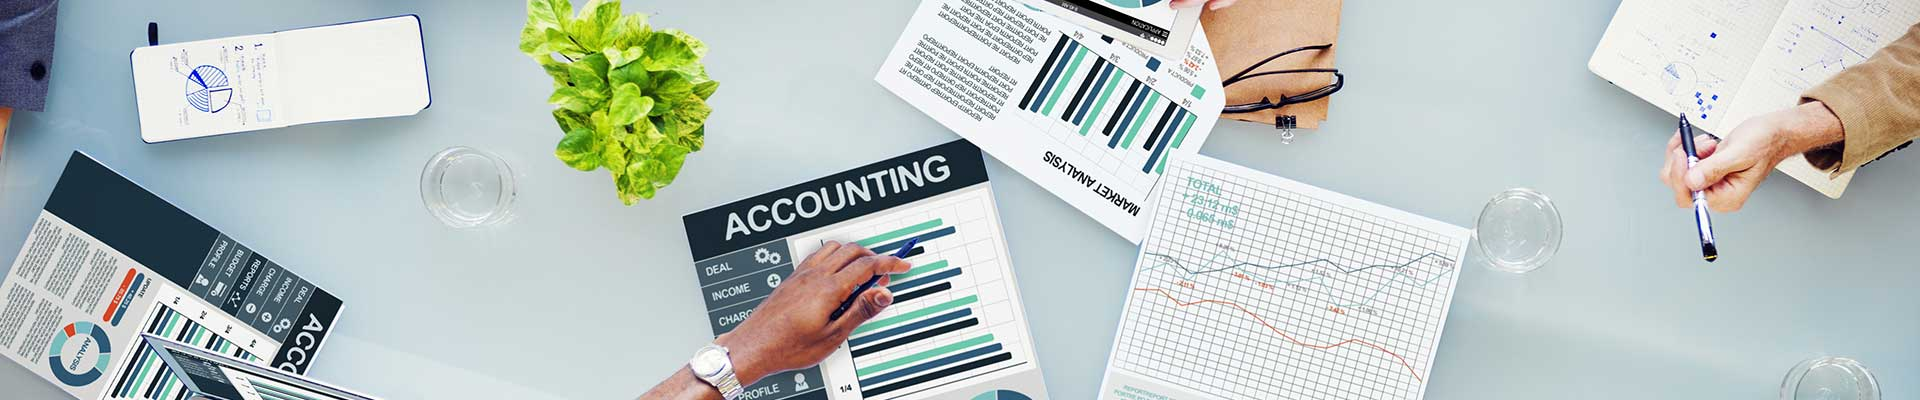 Accounting alt